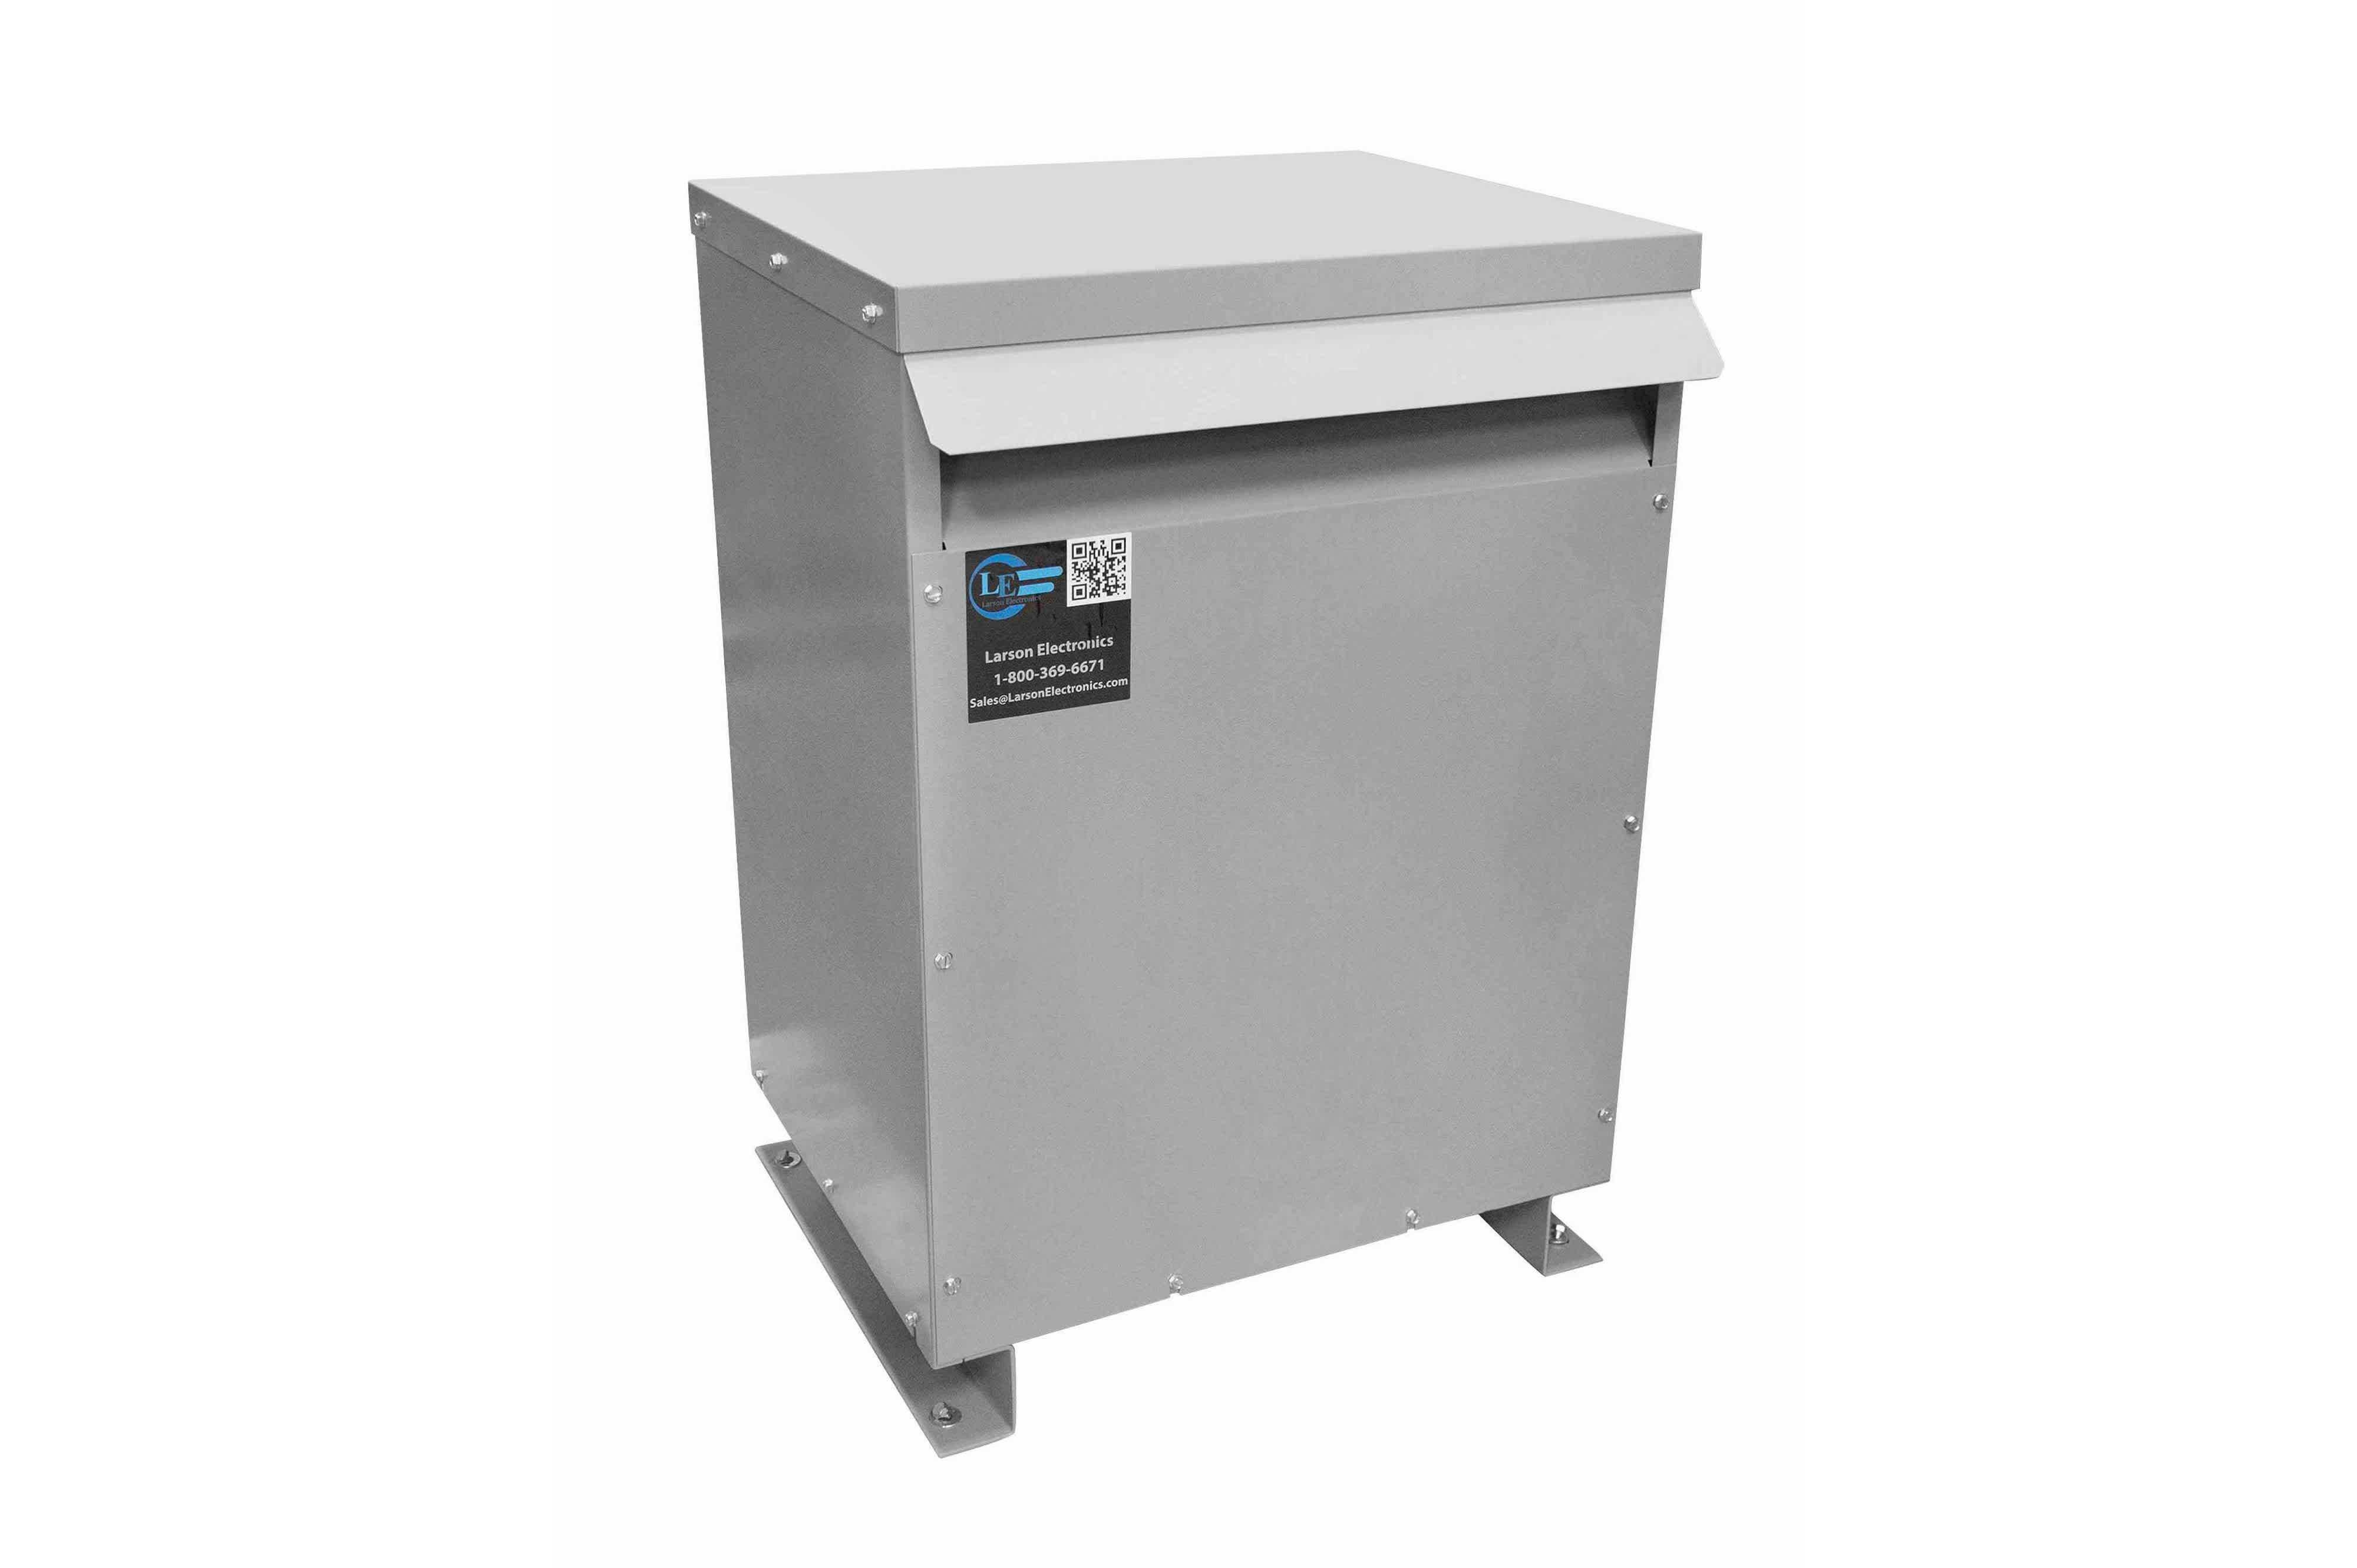 750 kVA 3PH Isolation Transformer, 480V Wye Primary, 480Y/277 Wye-N Secondary, N3R, Ventilated, 60 Hz